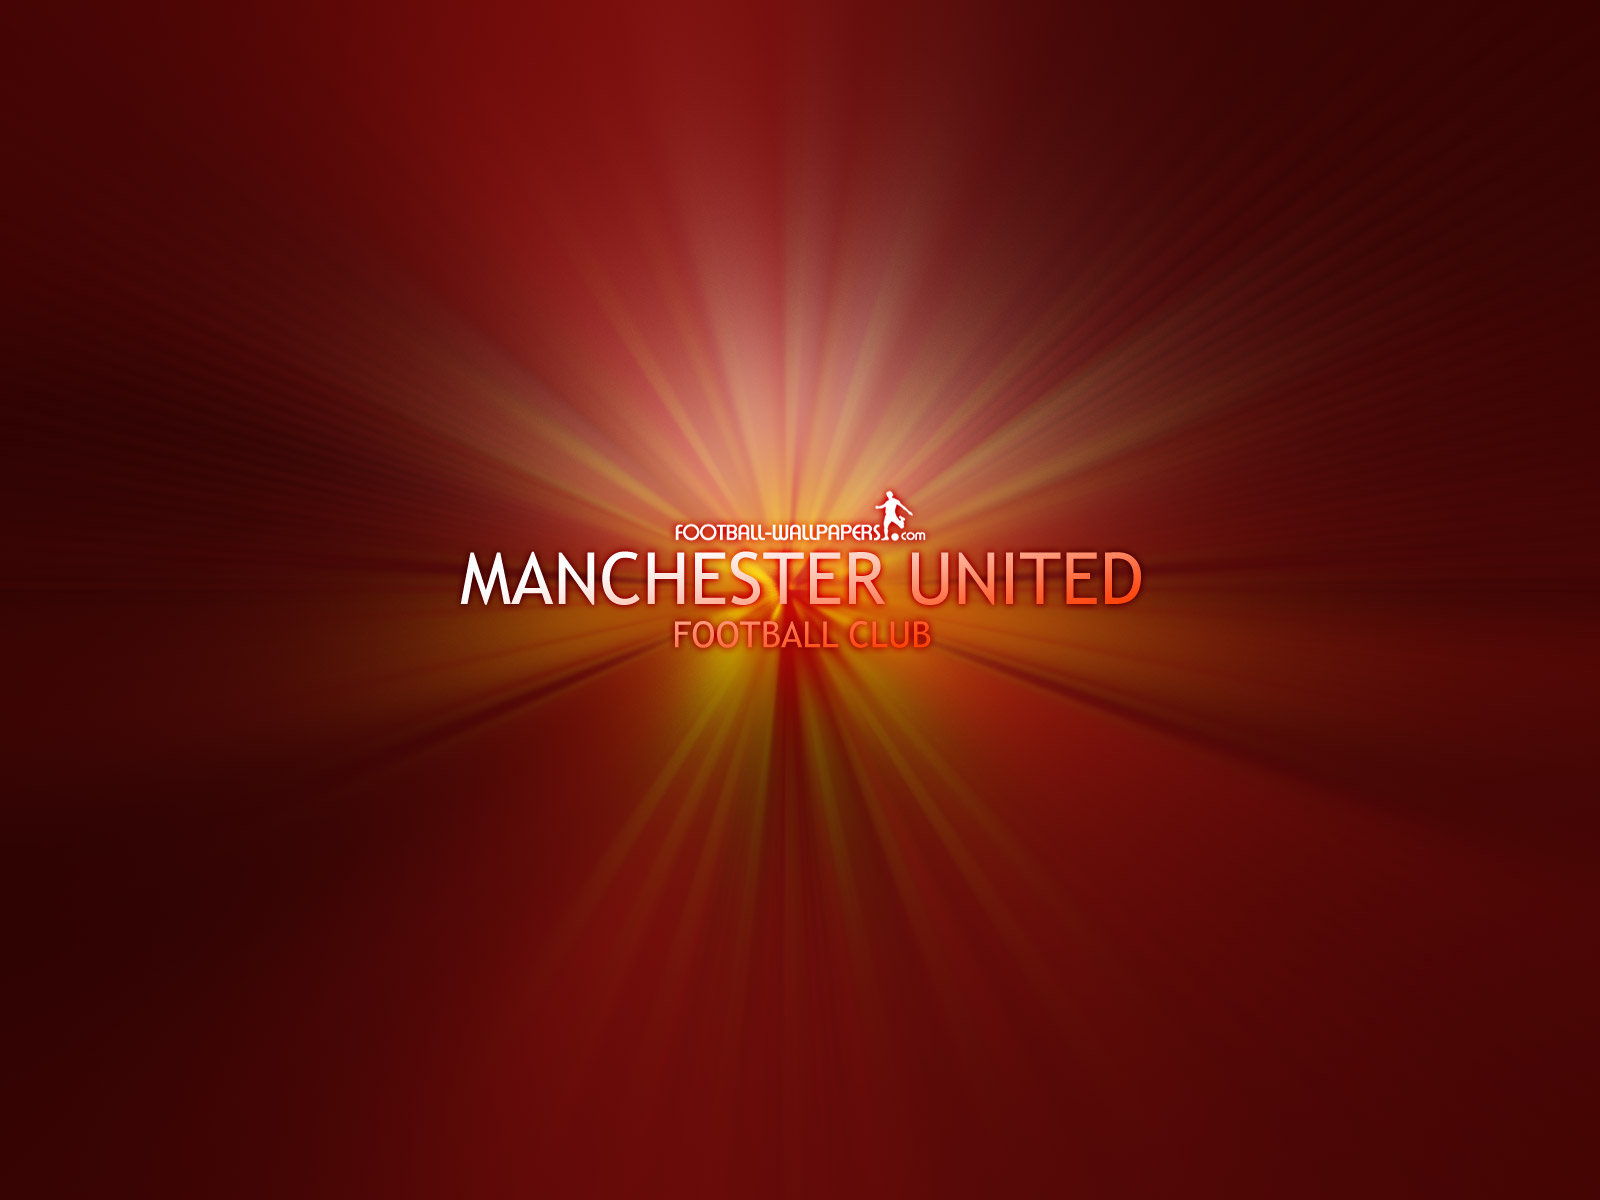 Manchester united wallpaper desktop wallpapers free hd - Manchester united latest wallpapers hd ...